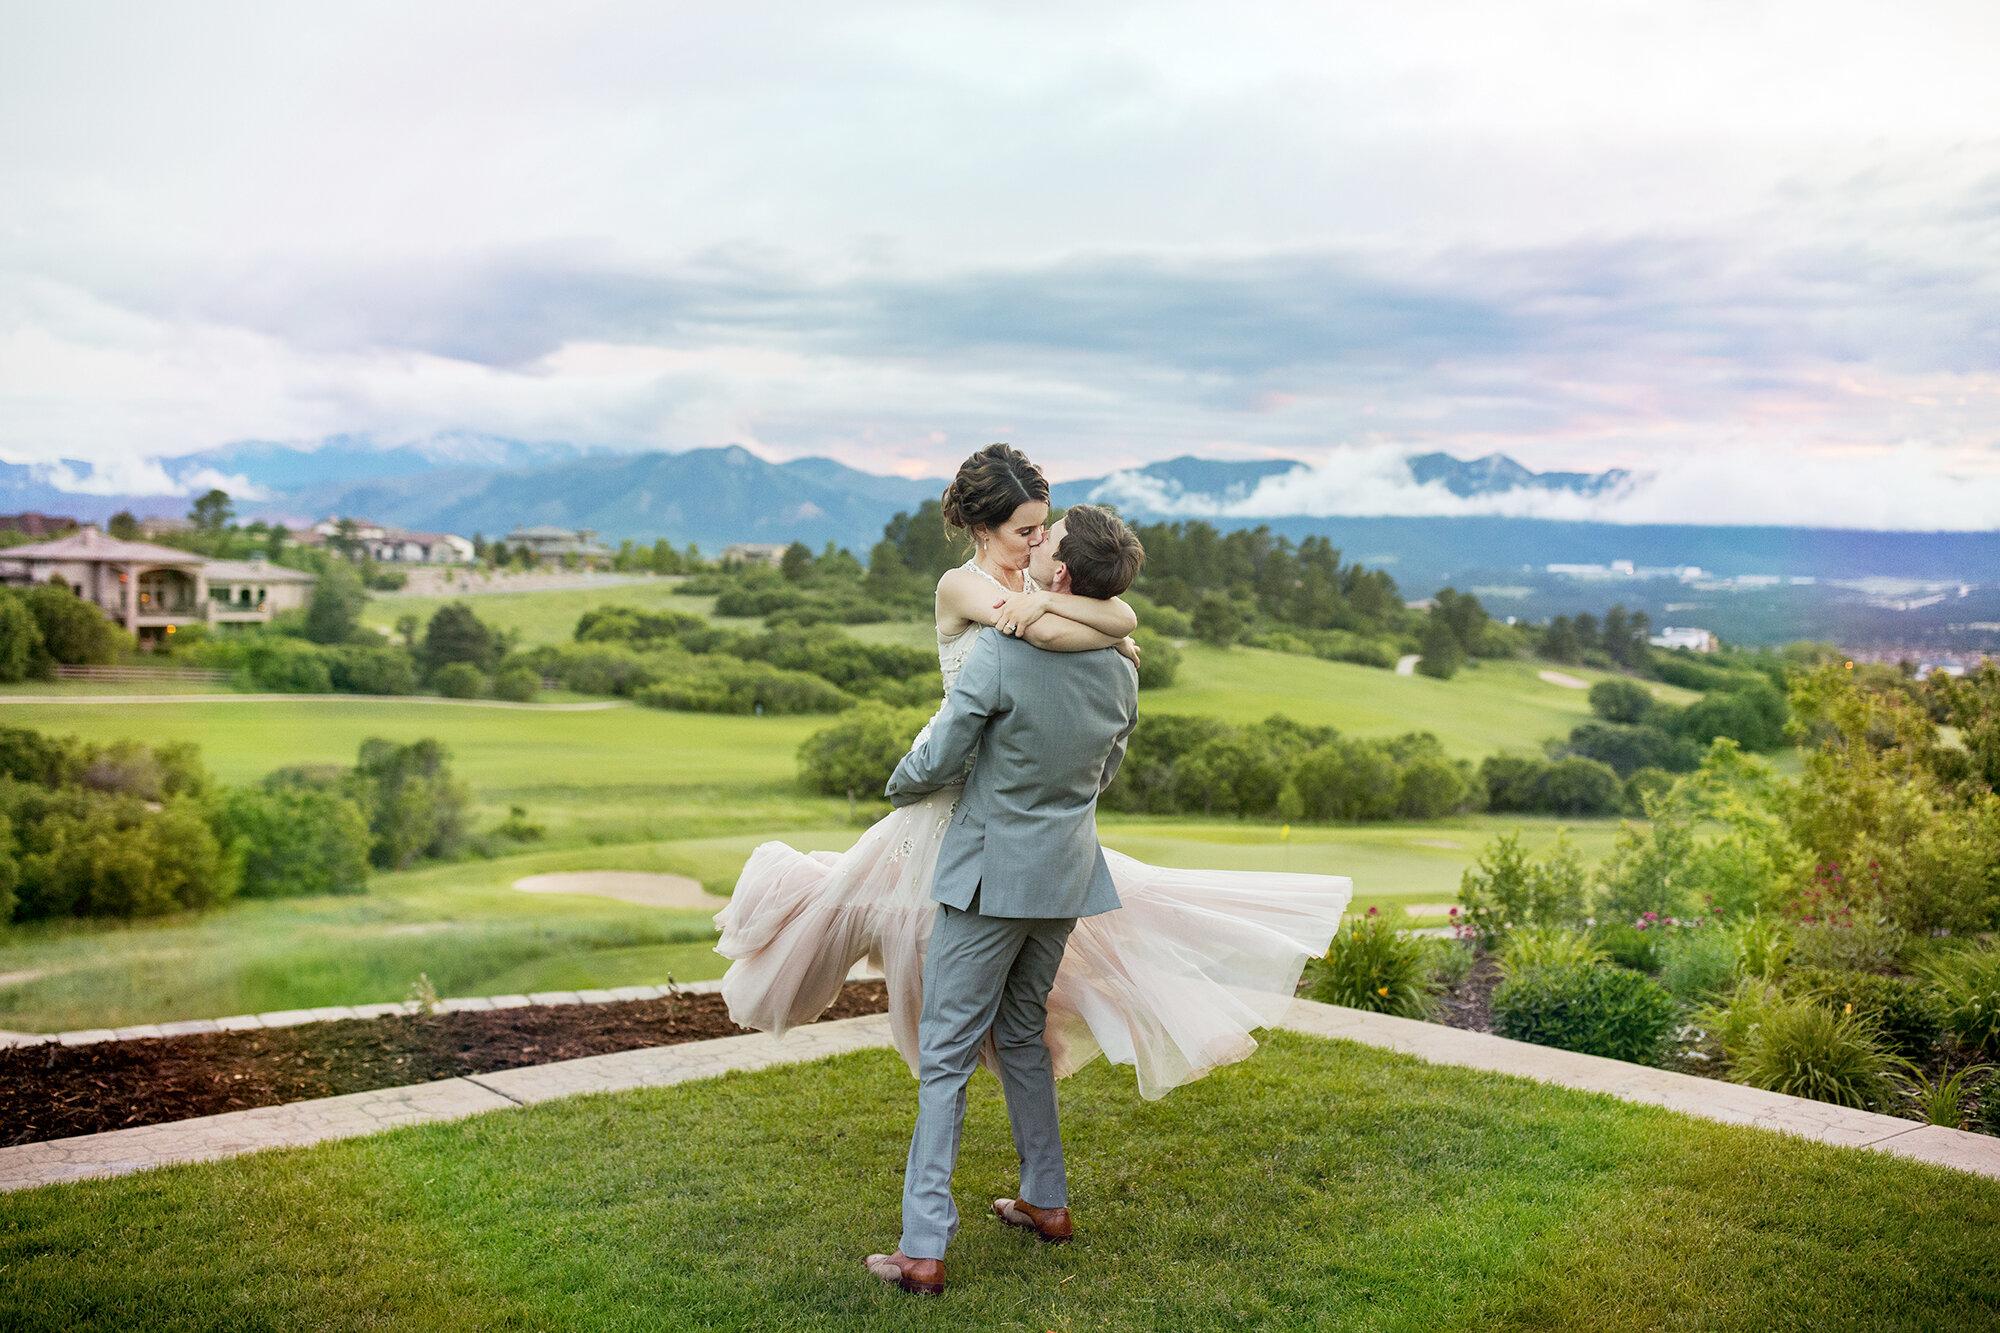 Seriously_Sabrina_Photography_Colorado_Springs_Club_at_Flying_Horse_Destination_Wedding_ODwyer87.jpg